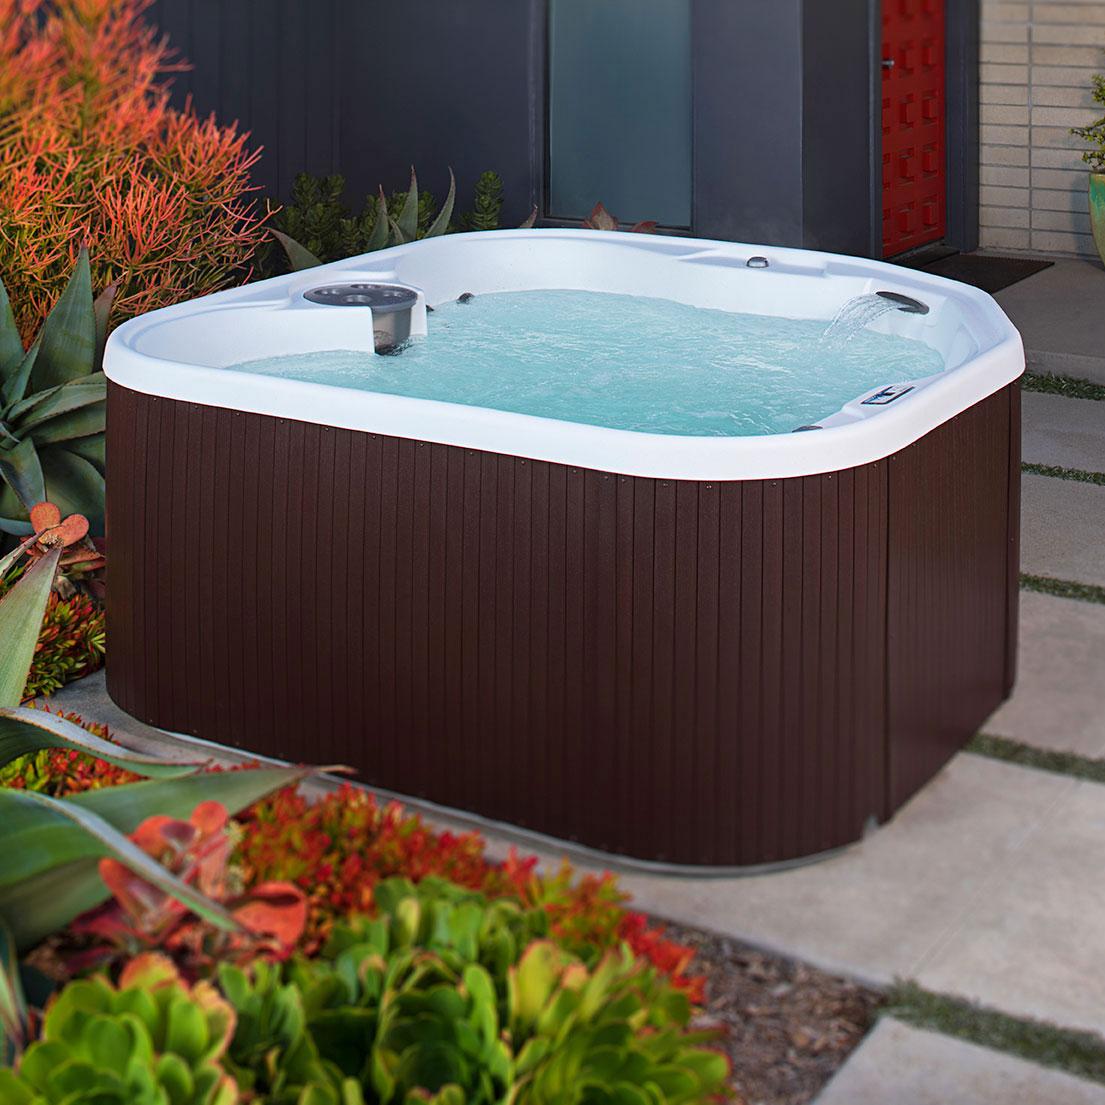 plastic spa tubs amazing parts beauty hot of watkins size full tub outstanding good spot wonderful